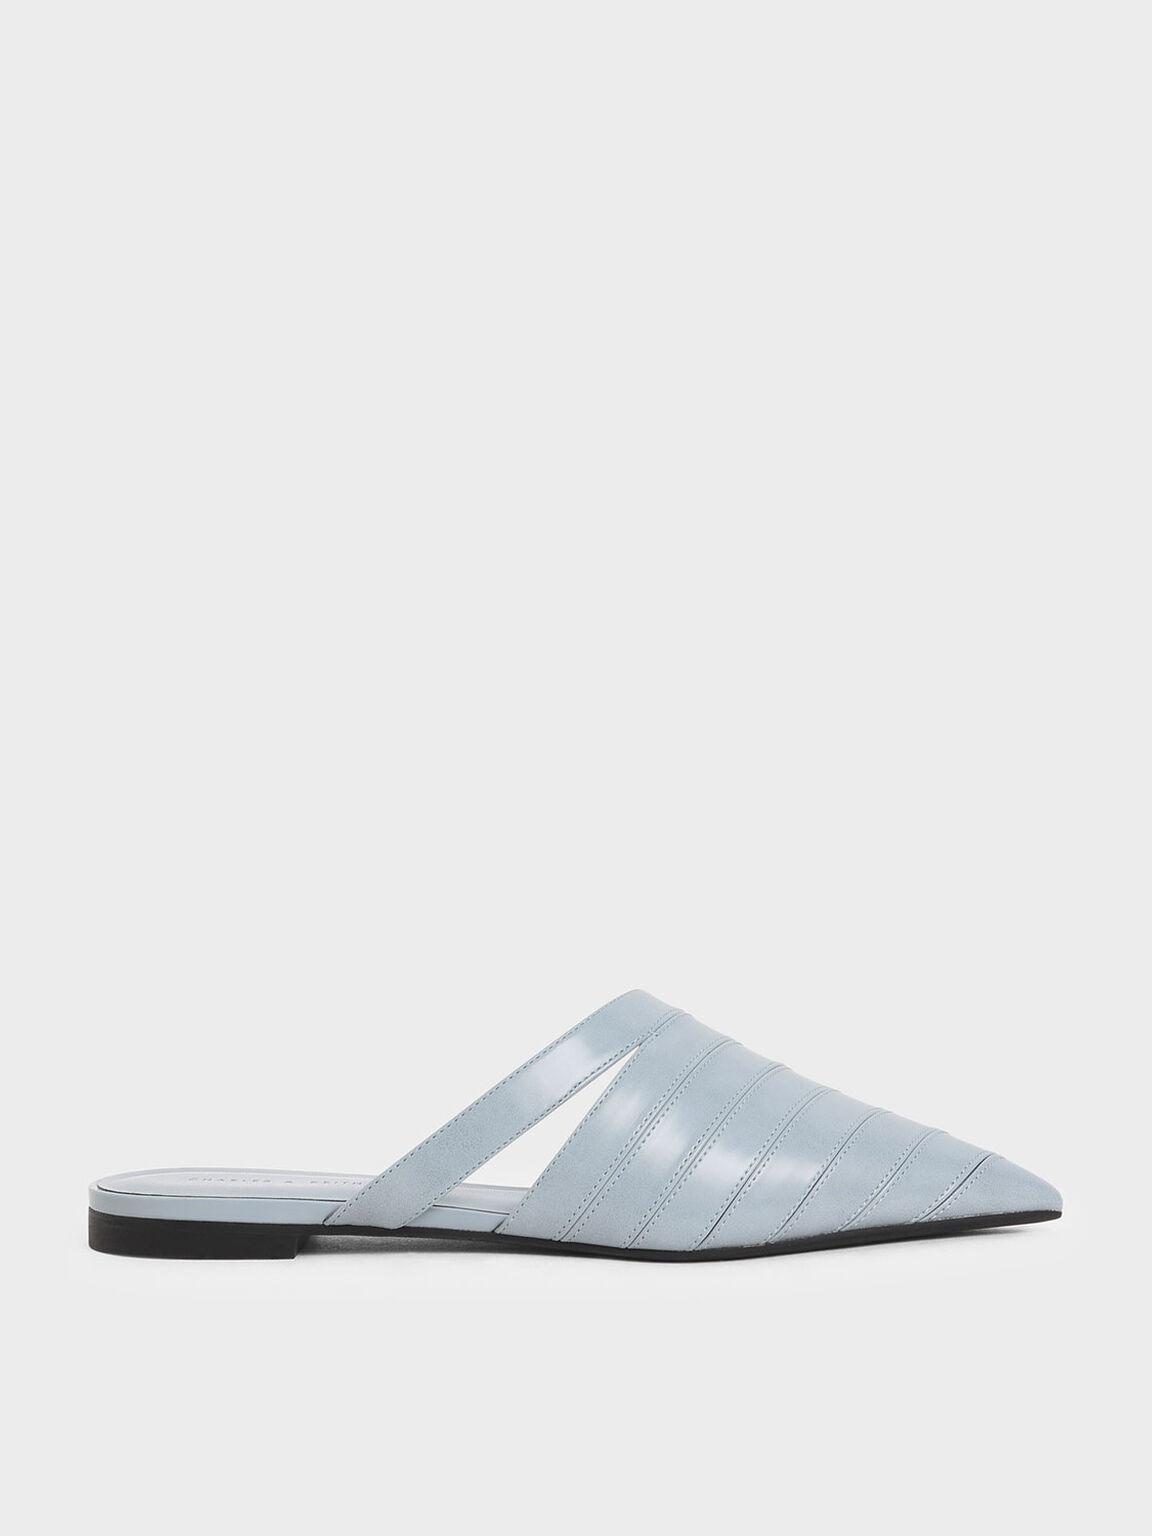 Asymmetric Pointed Toe Mules, Light Blue, hi-res